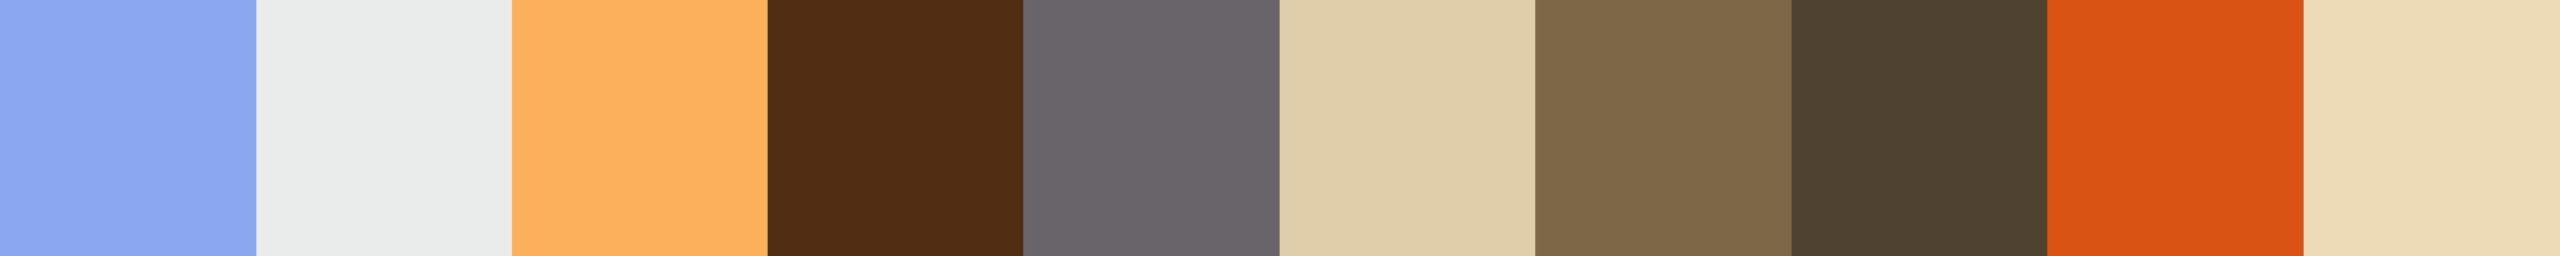 673 Vortizola Color Palette